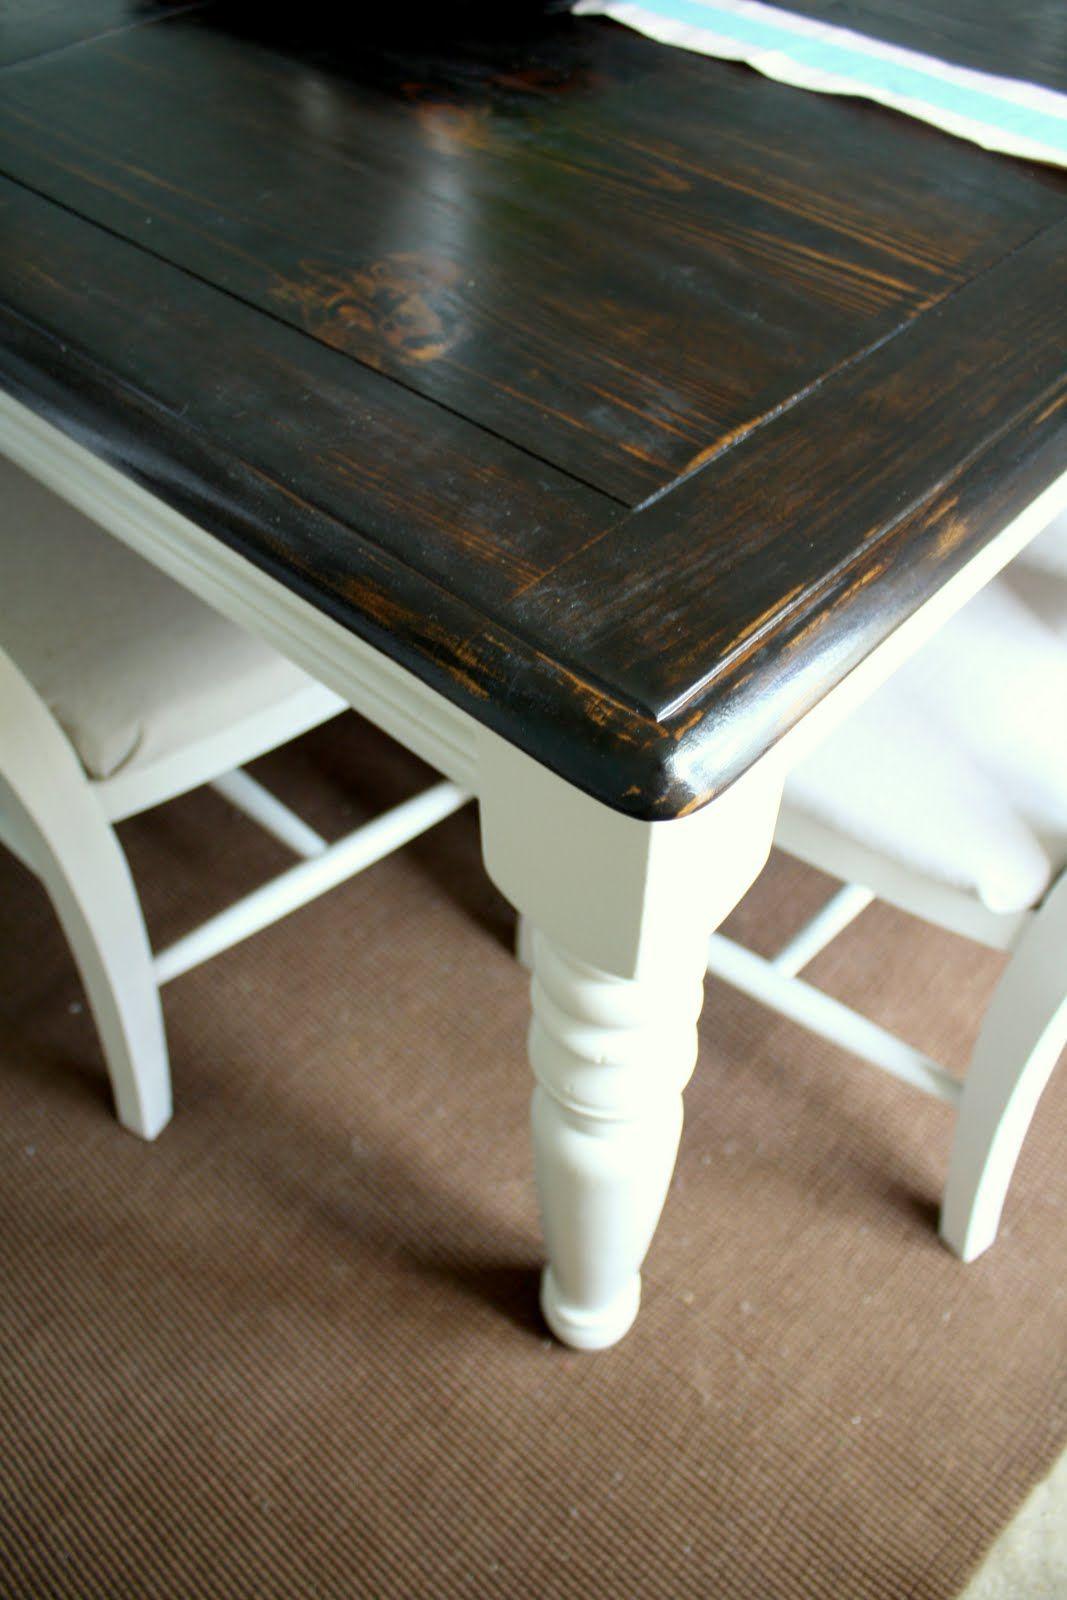 Table Refinishing Ideas Google Search Refinishing Kitchen